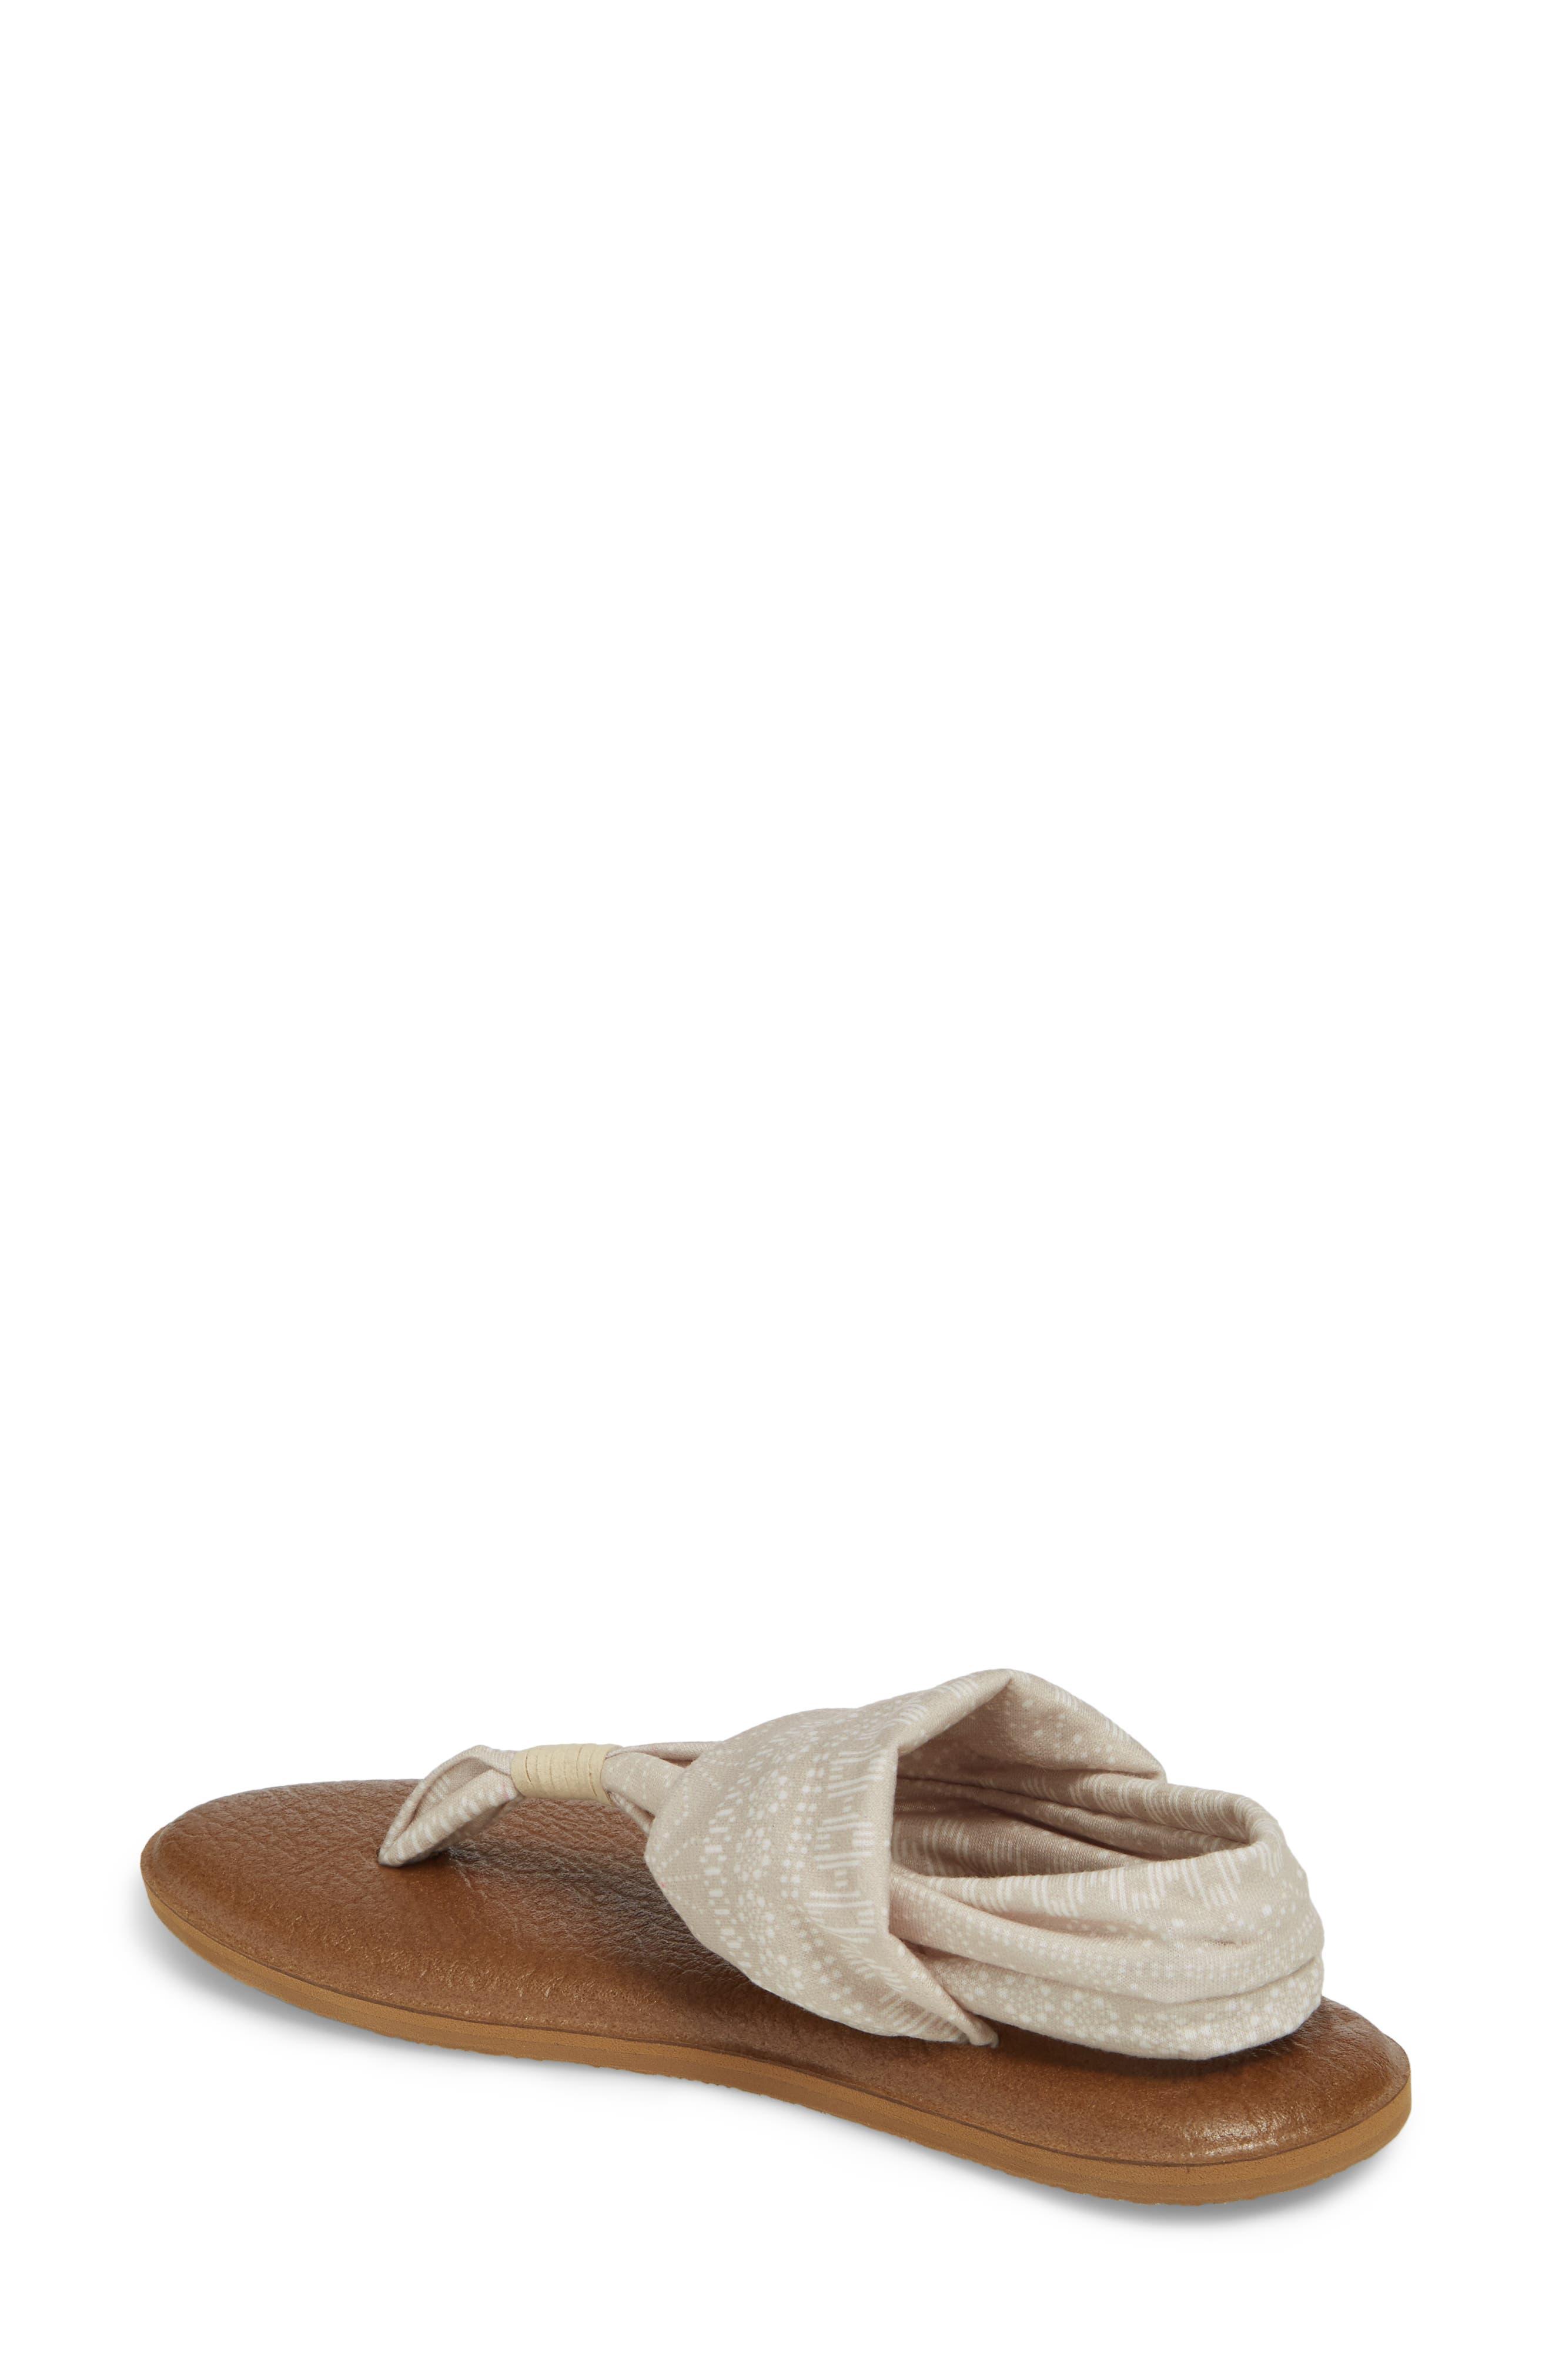 'Yoga Sling 2' Sandal,                             Alternate thumbnail 31, color,